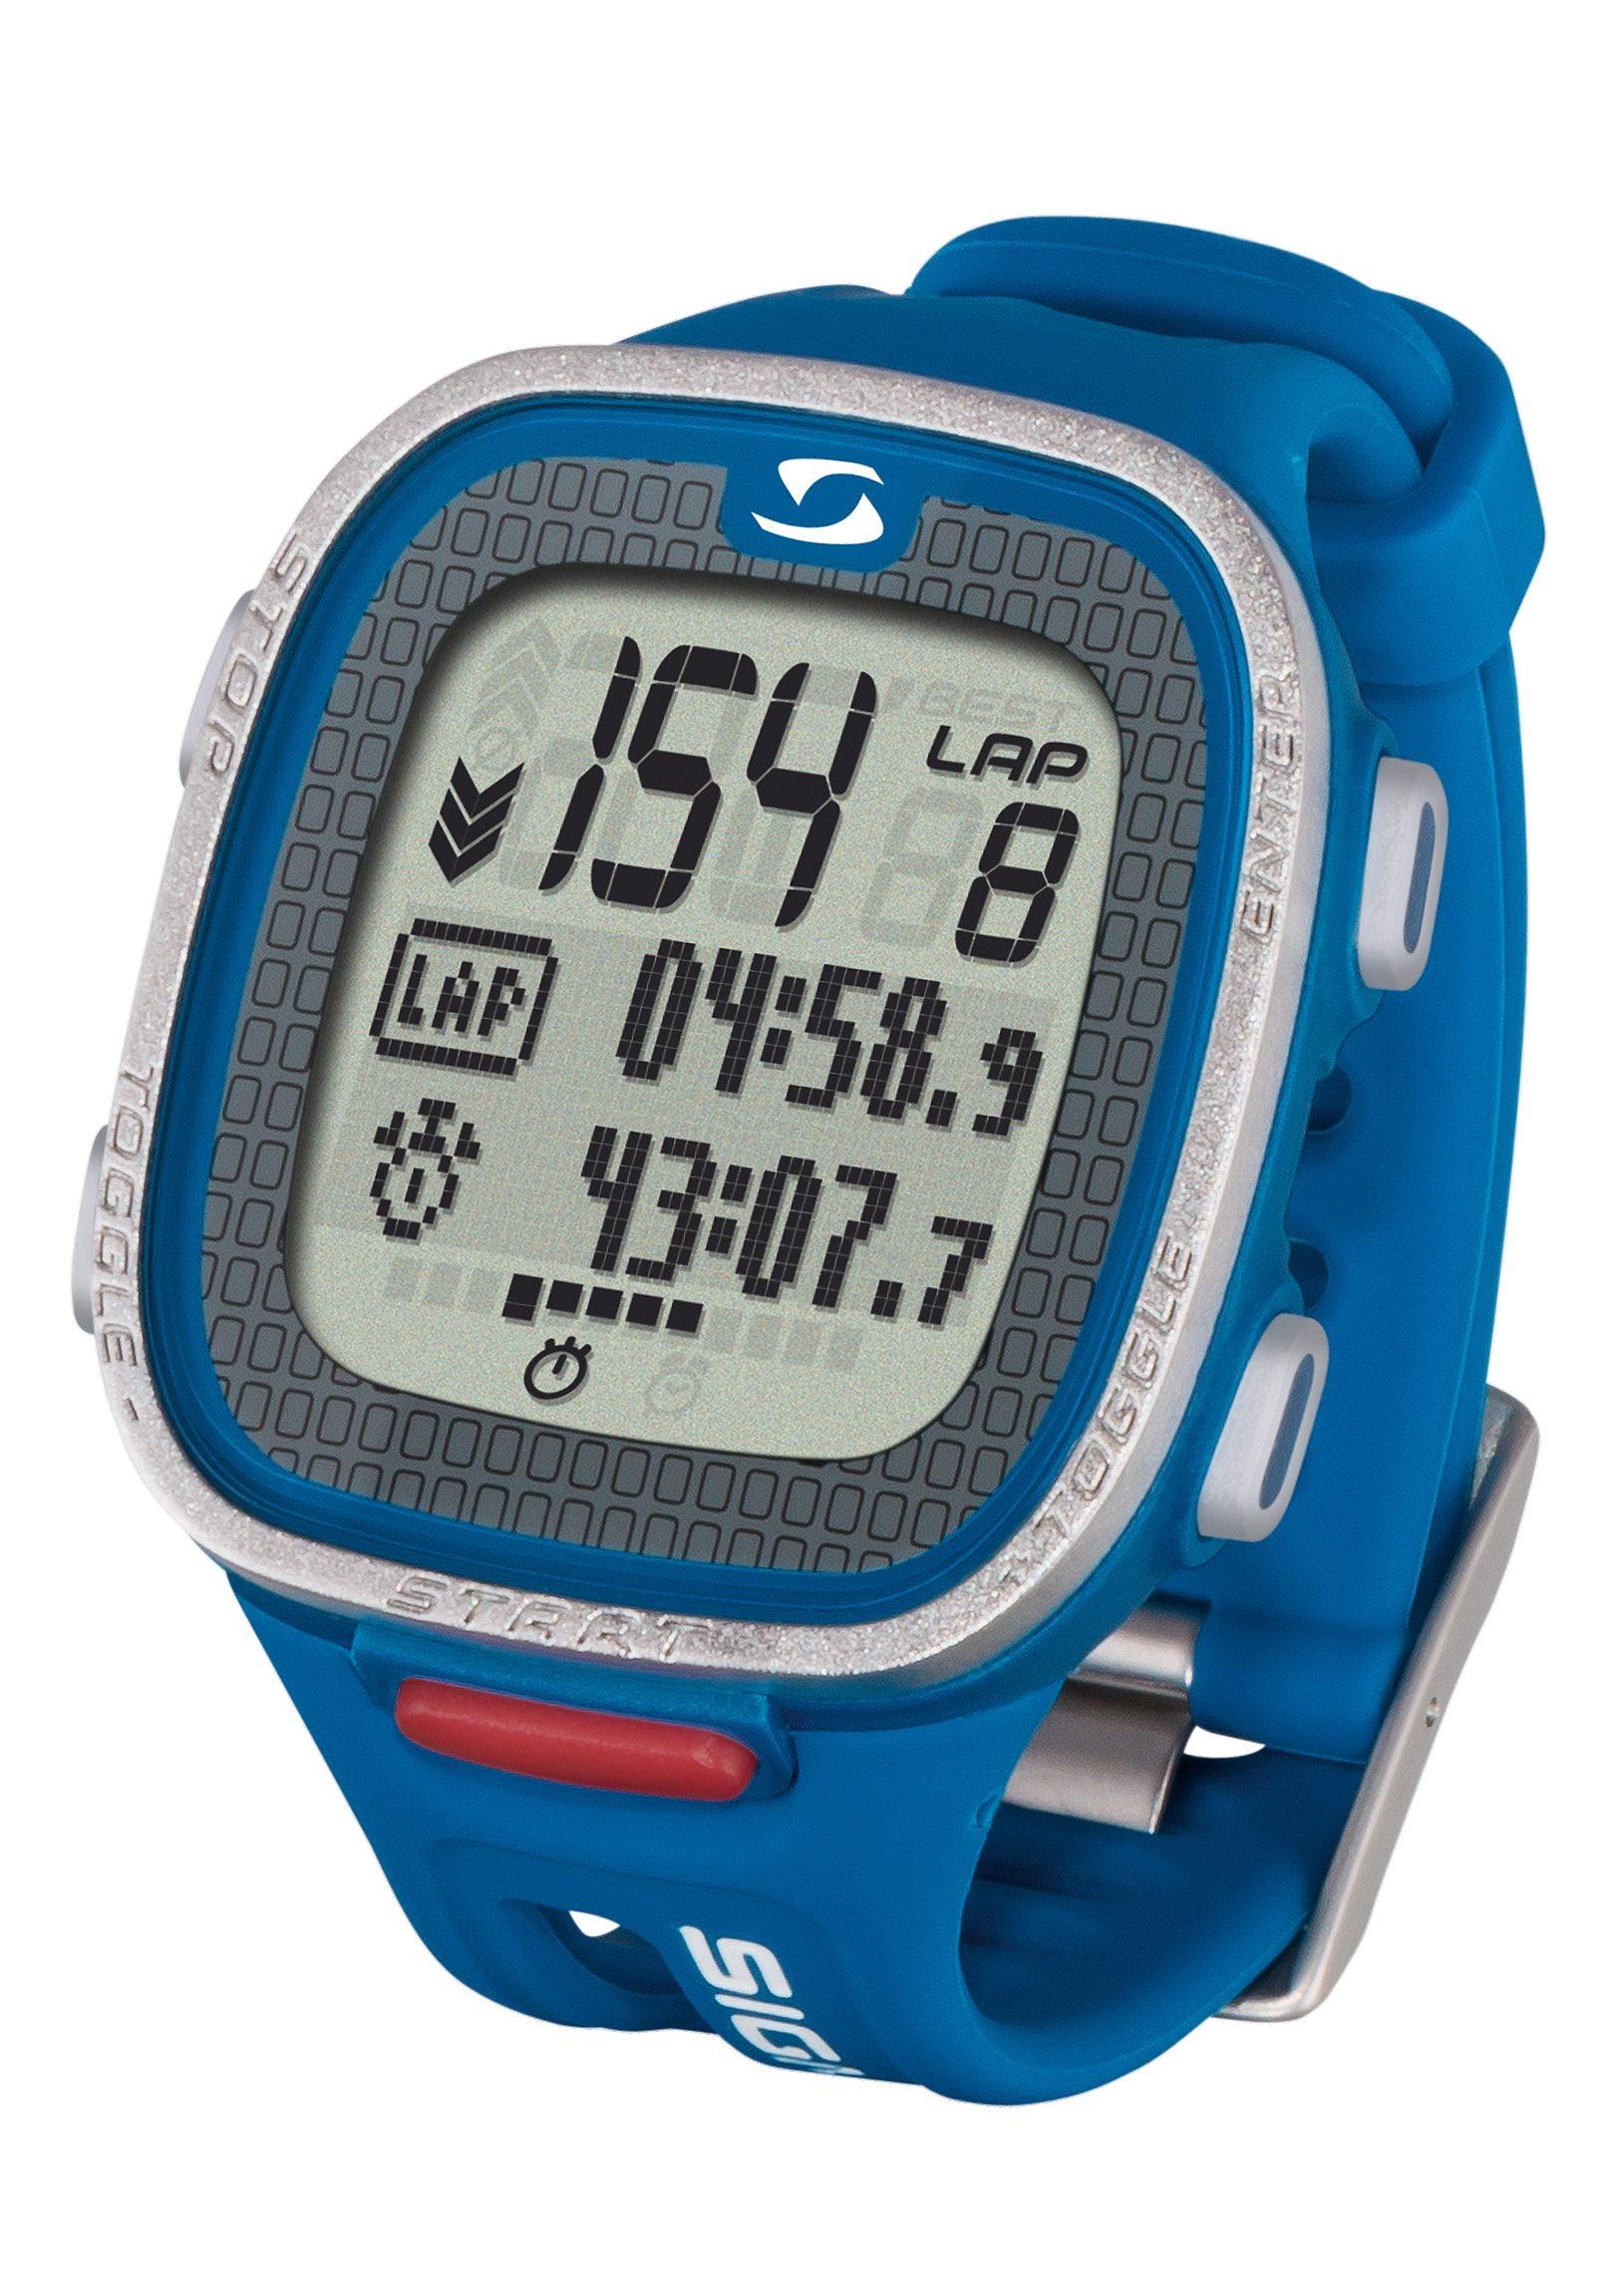 Sigma Sport Pulsuhr inkl. Brustgurt, blau, »PC 26.14«